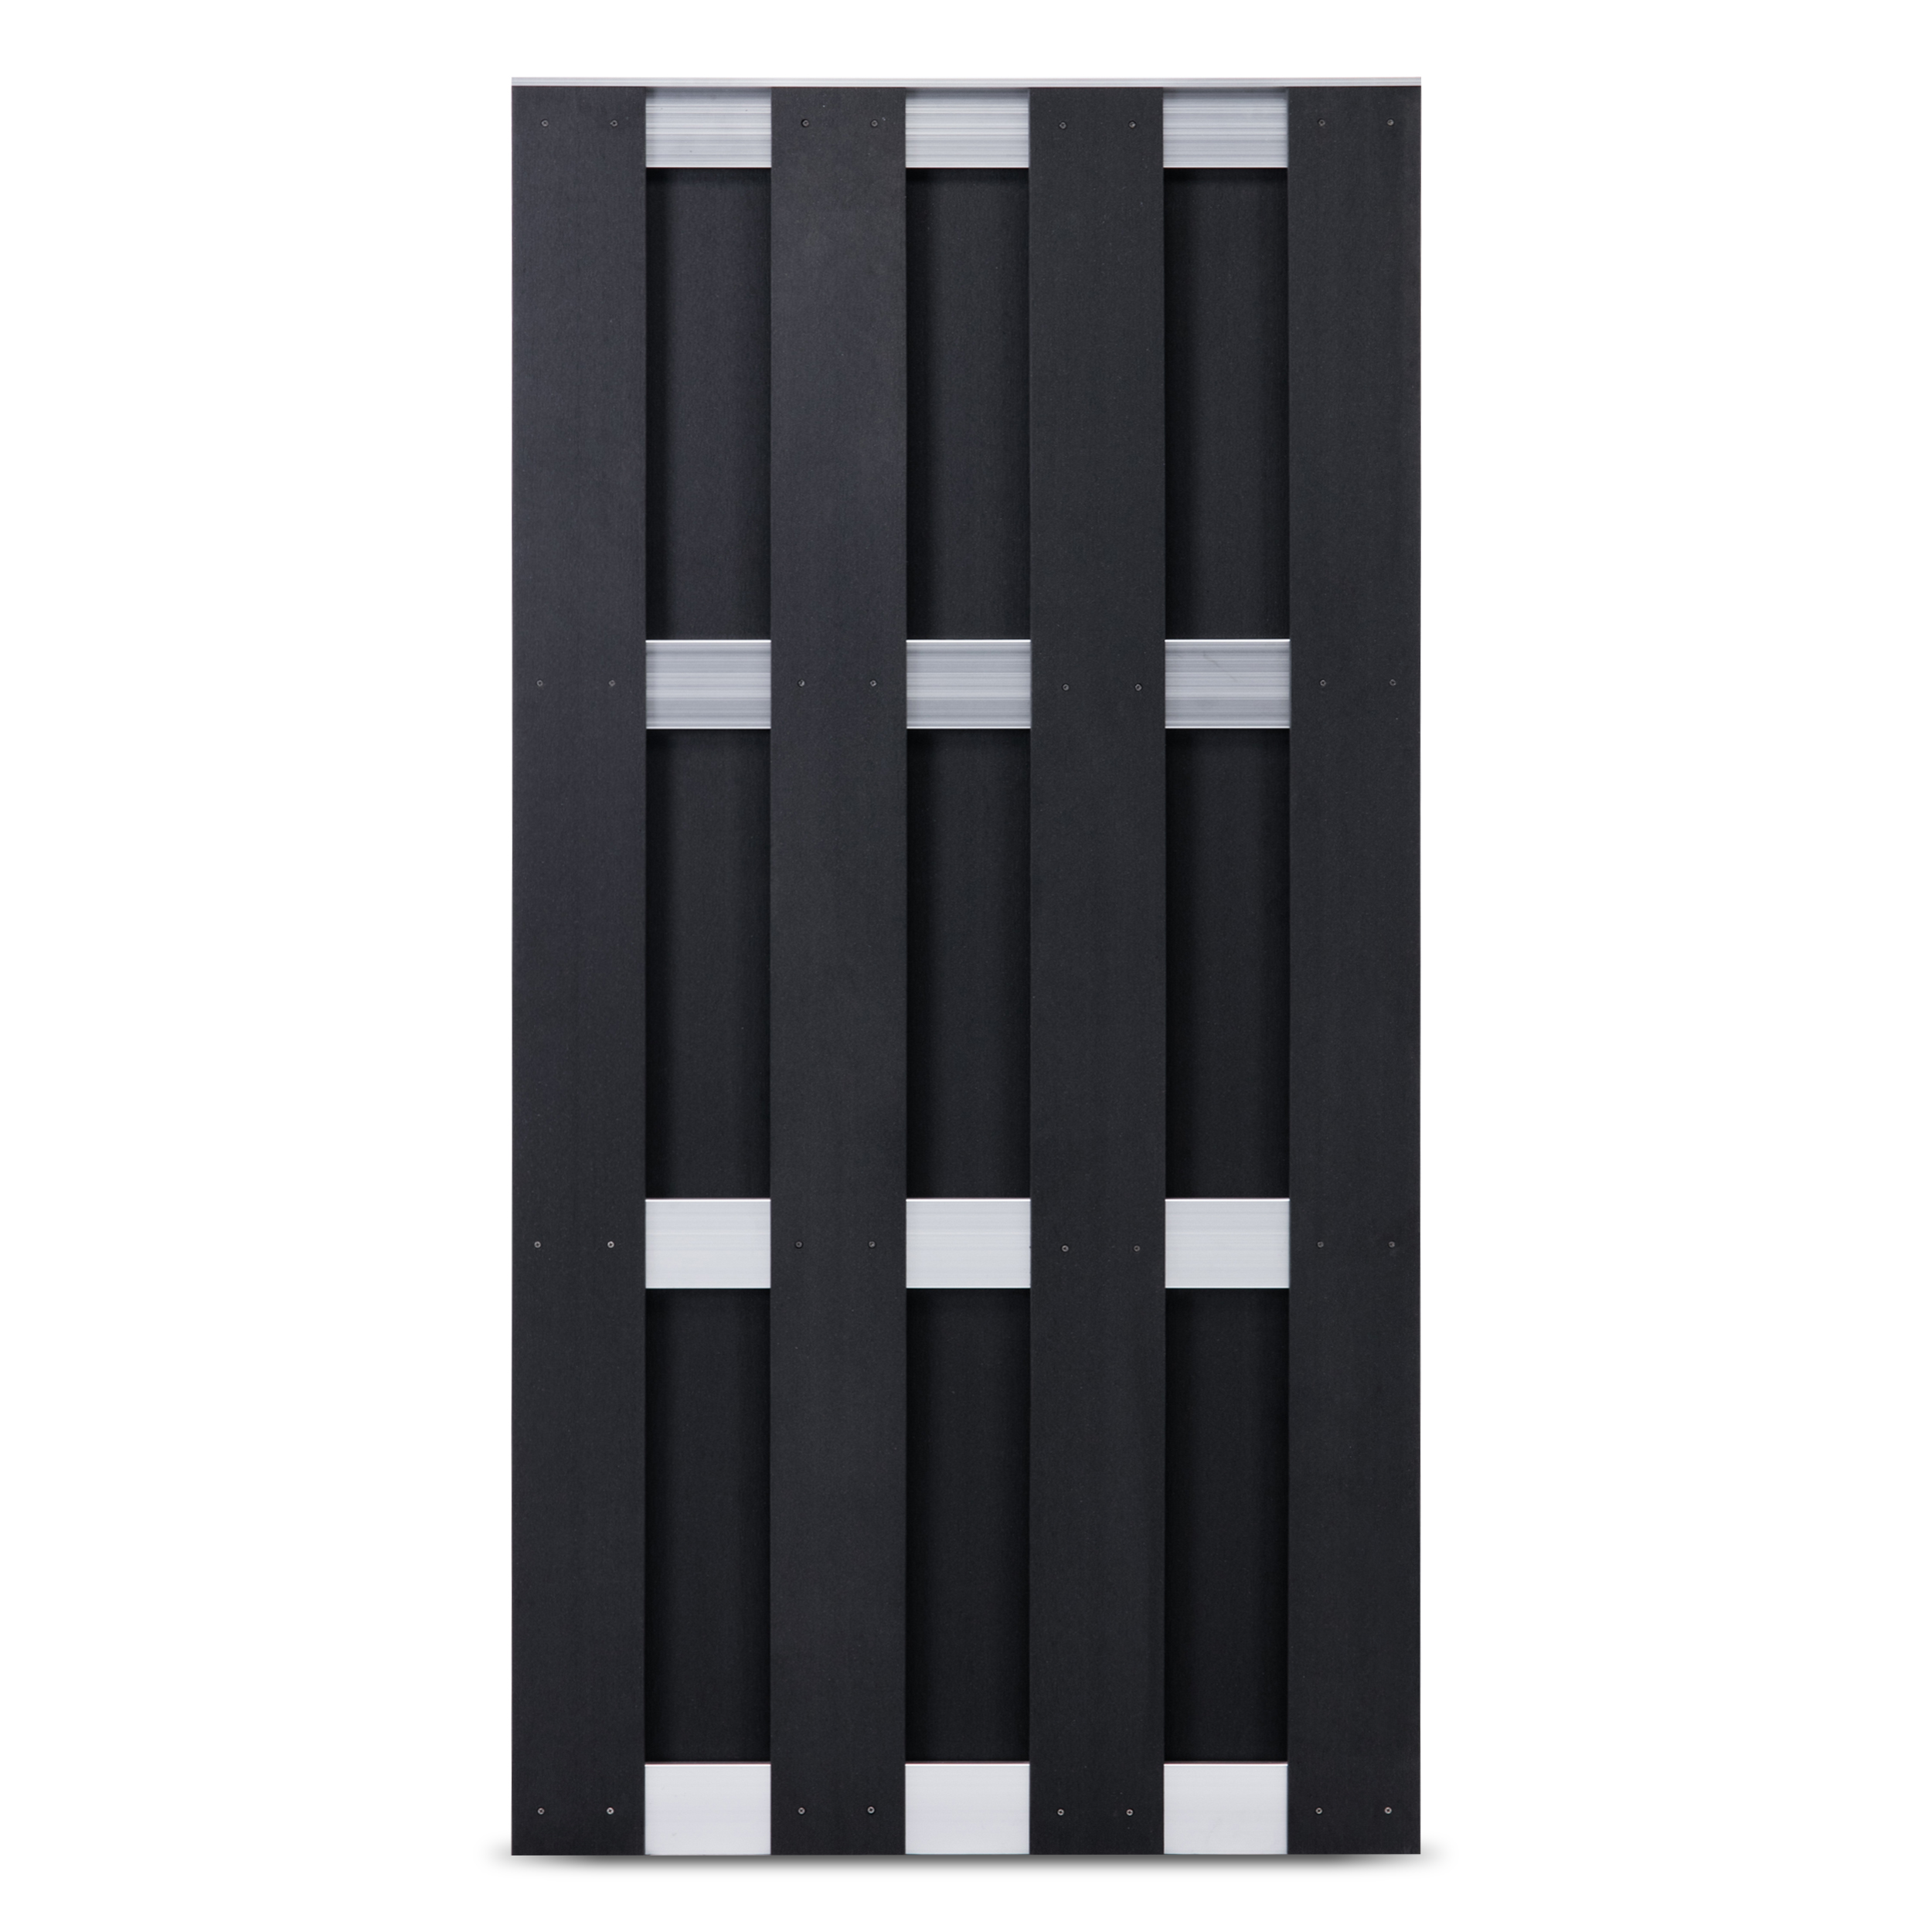 WPC Silver Line Fertigzaunelement 90 x 180 cm Anthrazit / Silber